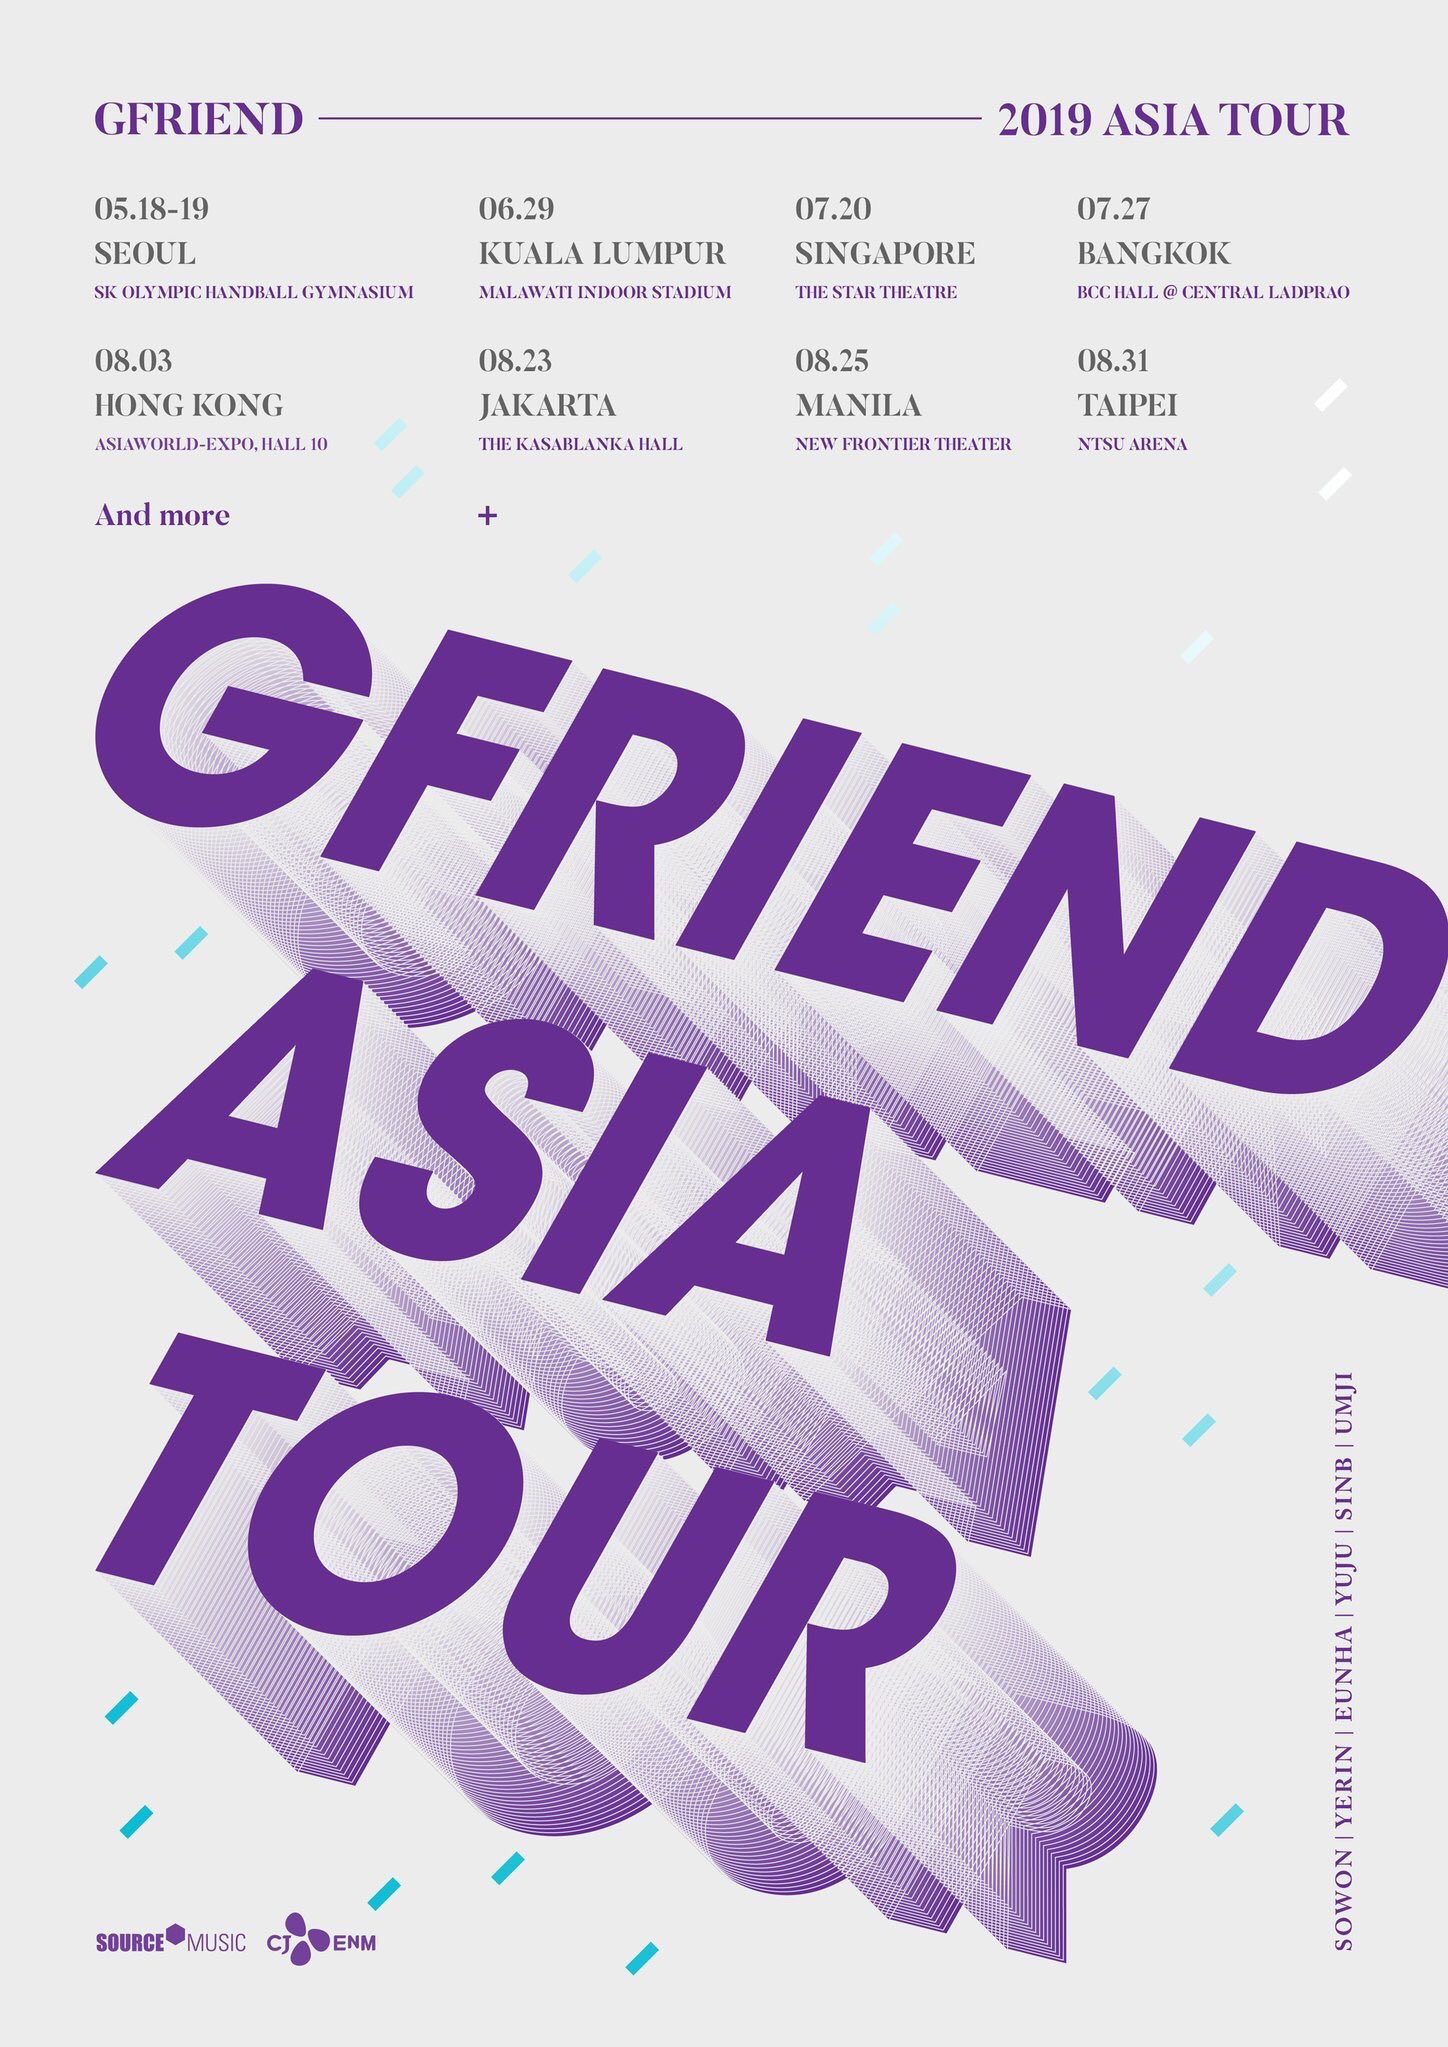 gfriend, gfriend profile, gfriend height, gfriend members, gfriend age, gfriend facts, gfriend asia tour, gfriend facts, gfriend asia tour, gfriend leader,